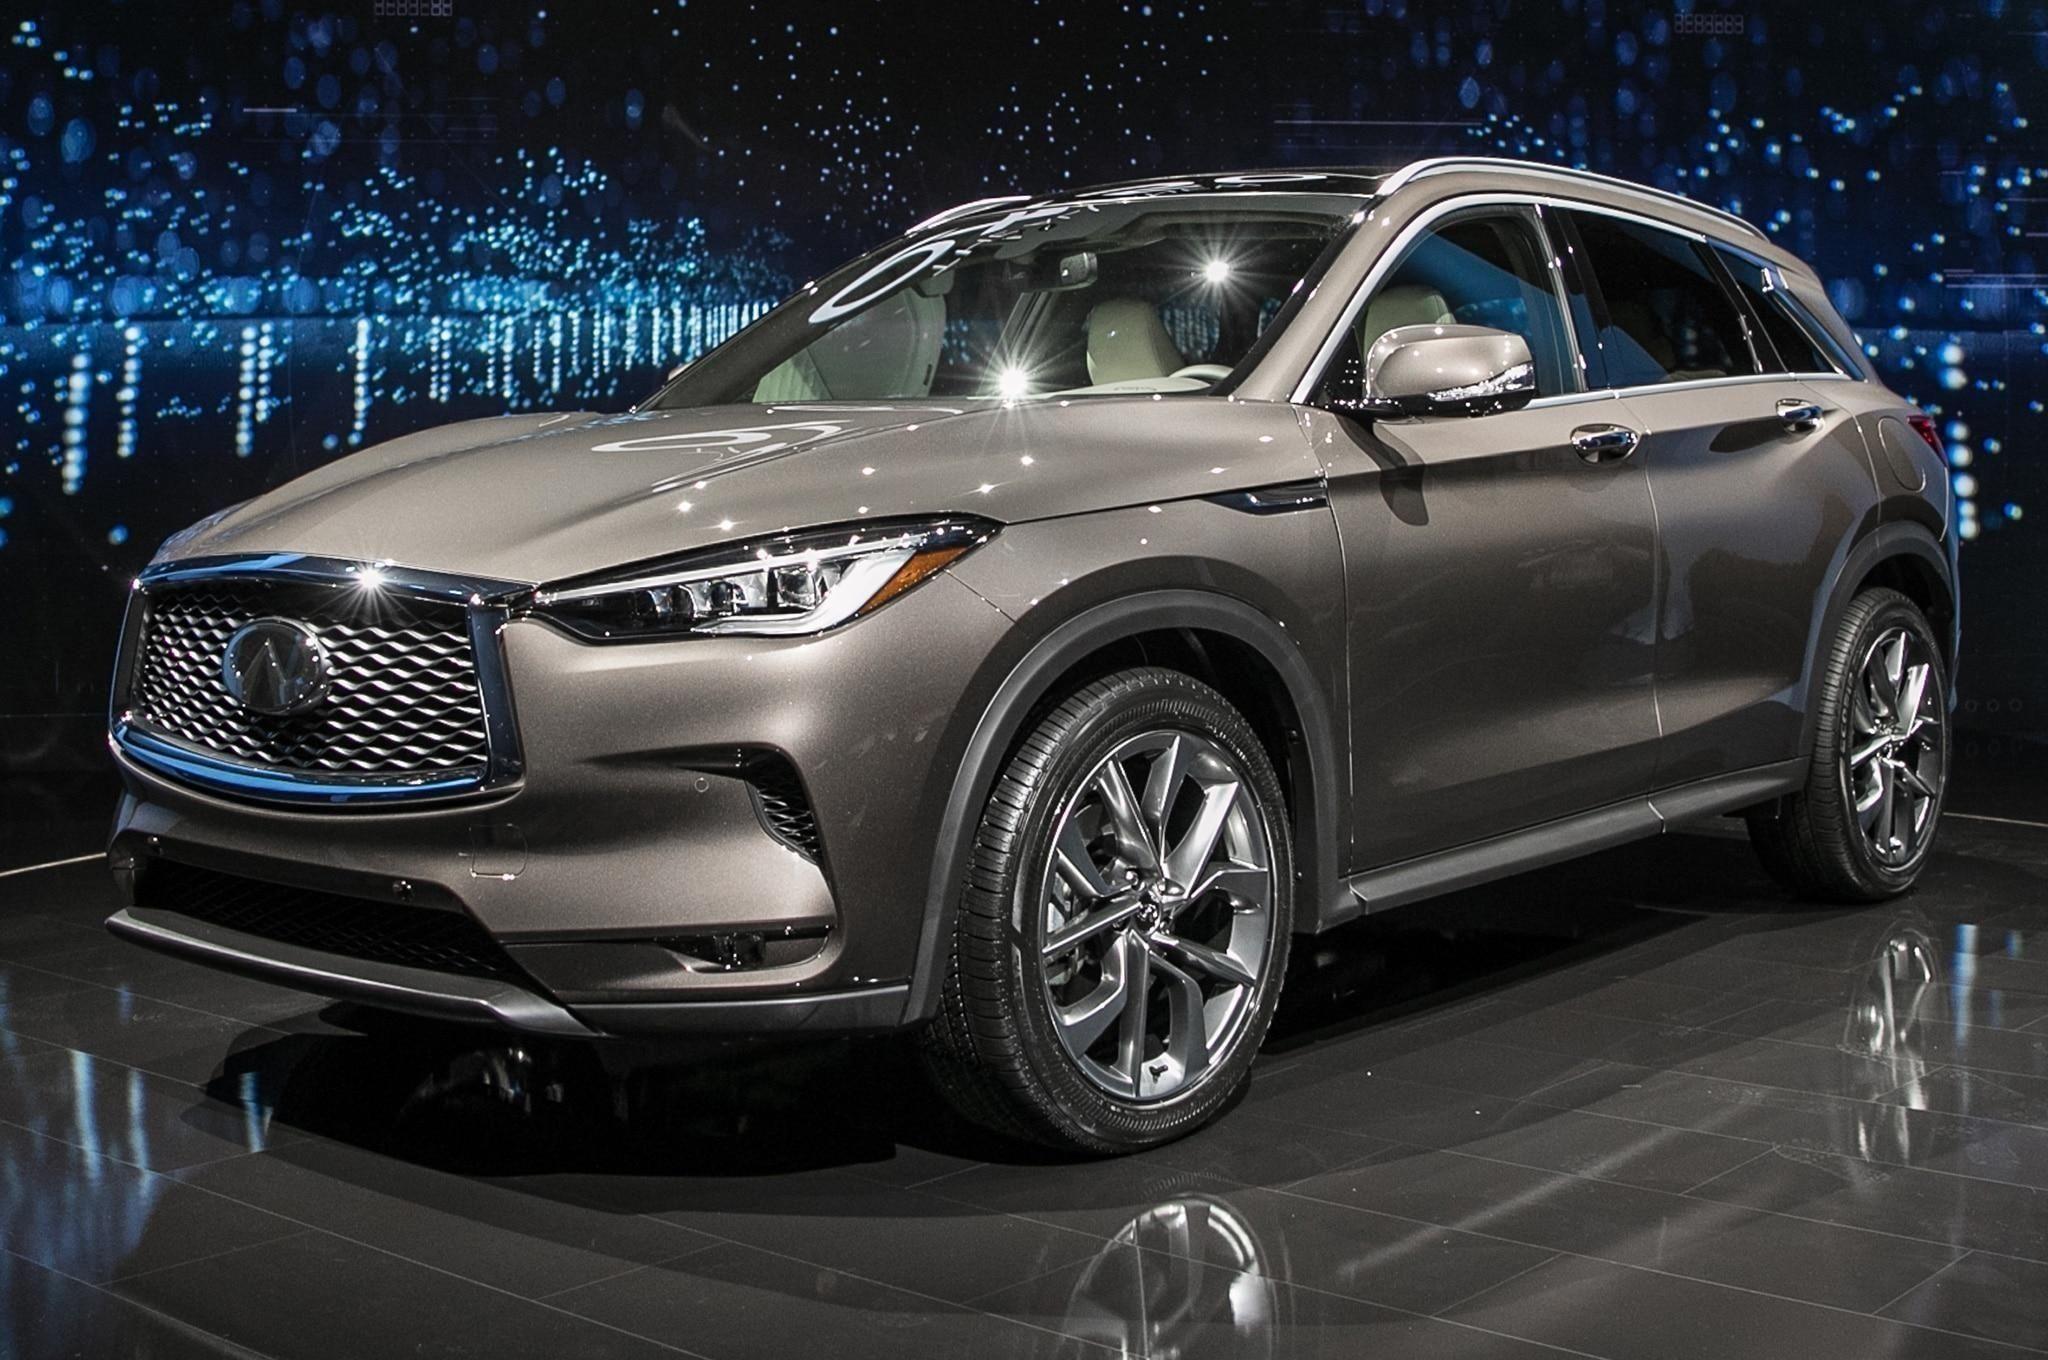 The 2019 Infiniti G37 Price And Release Date Infiniti Car Review Infiniti G37